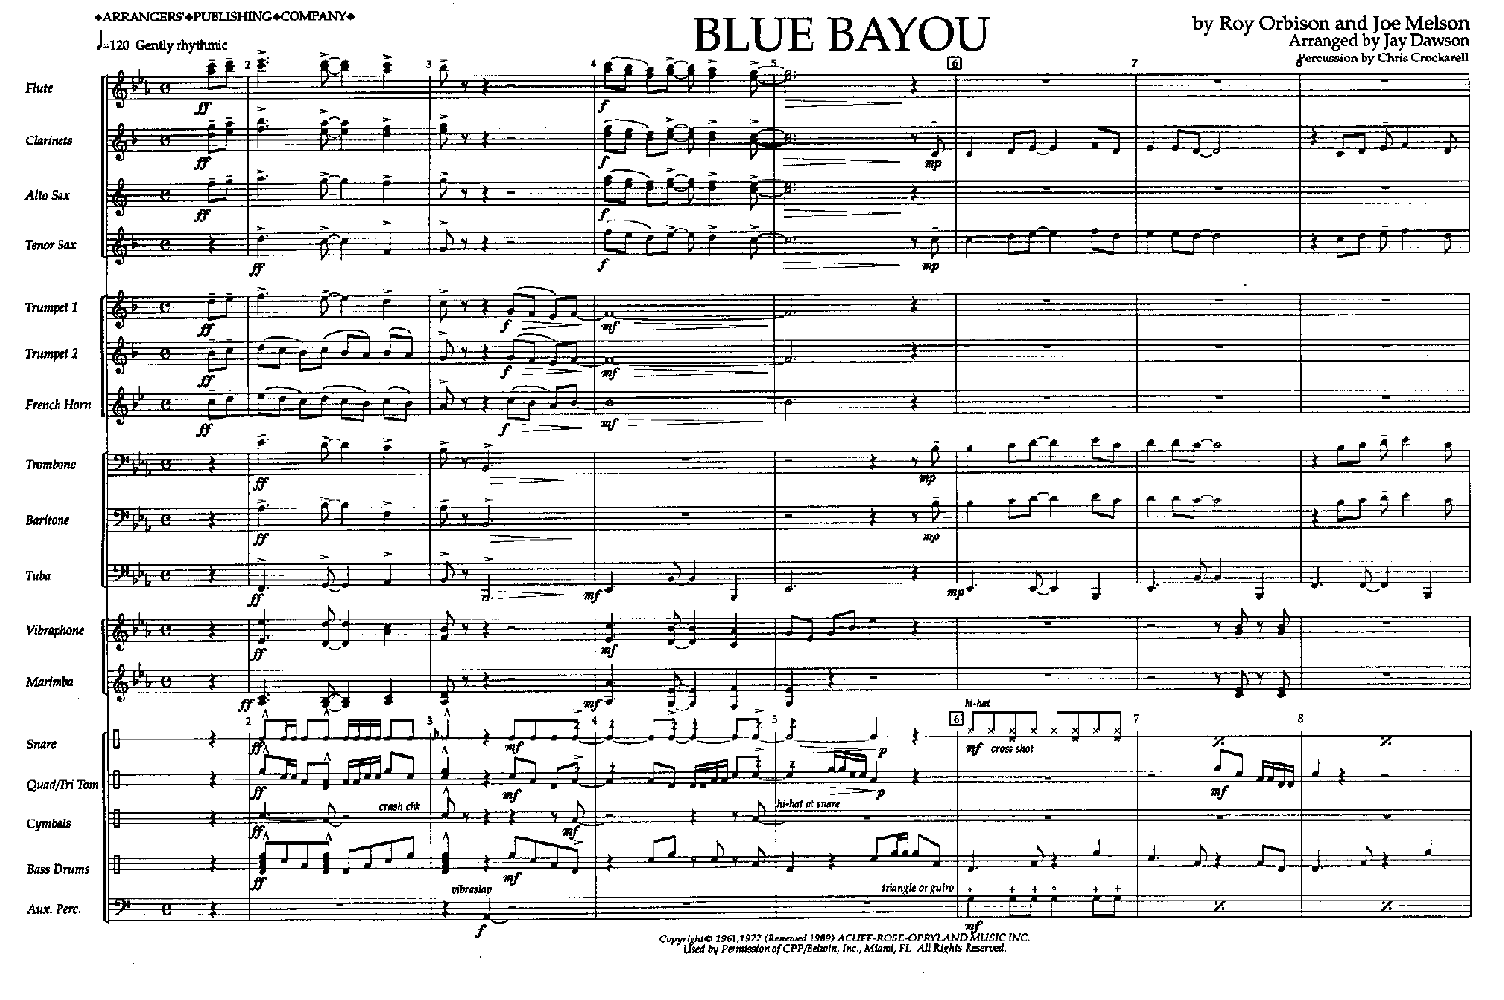 Blue Bayou Sheet Music Keninamas